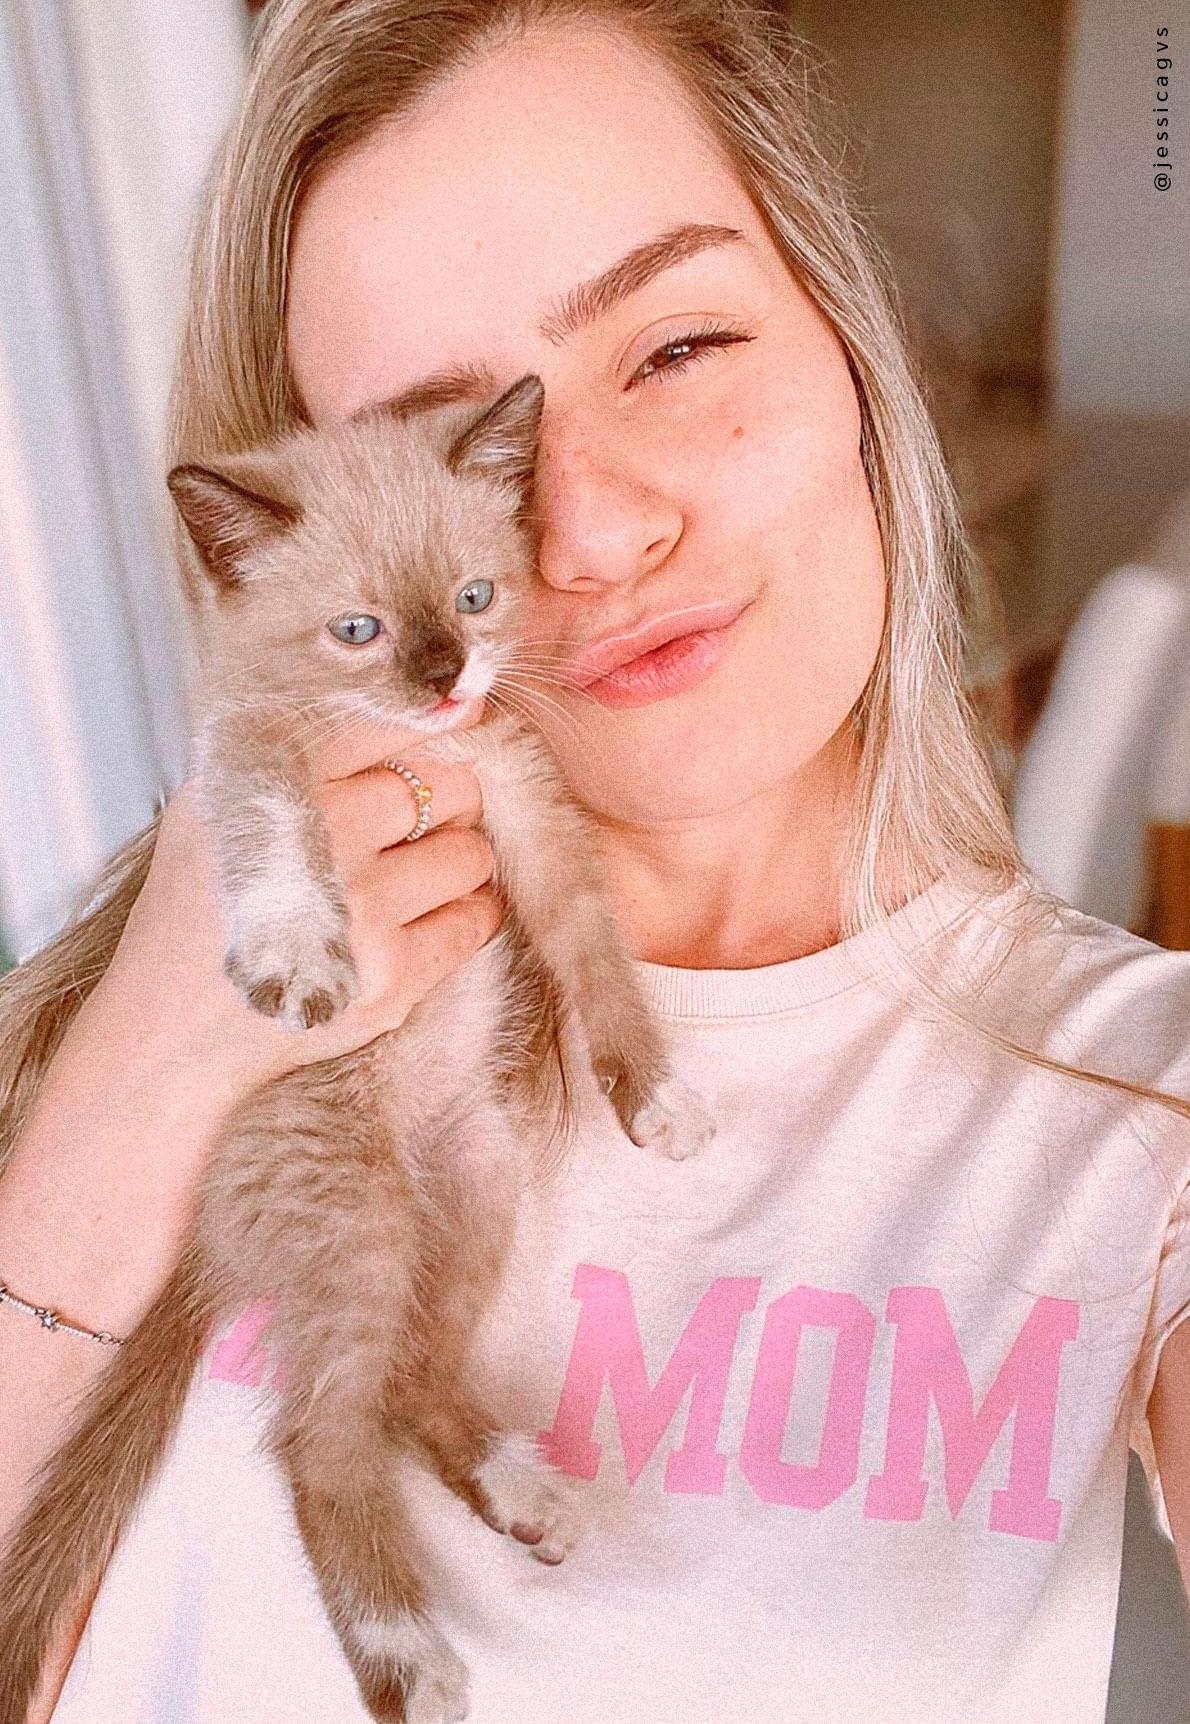 31474-tee-cat-mom-08